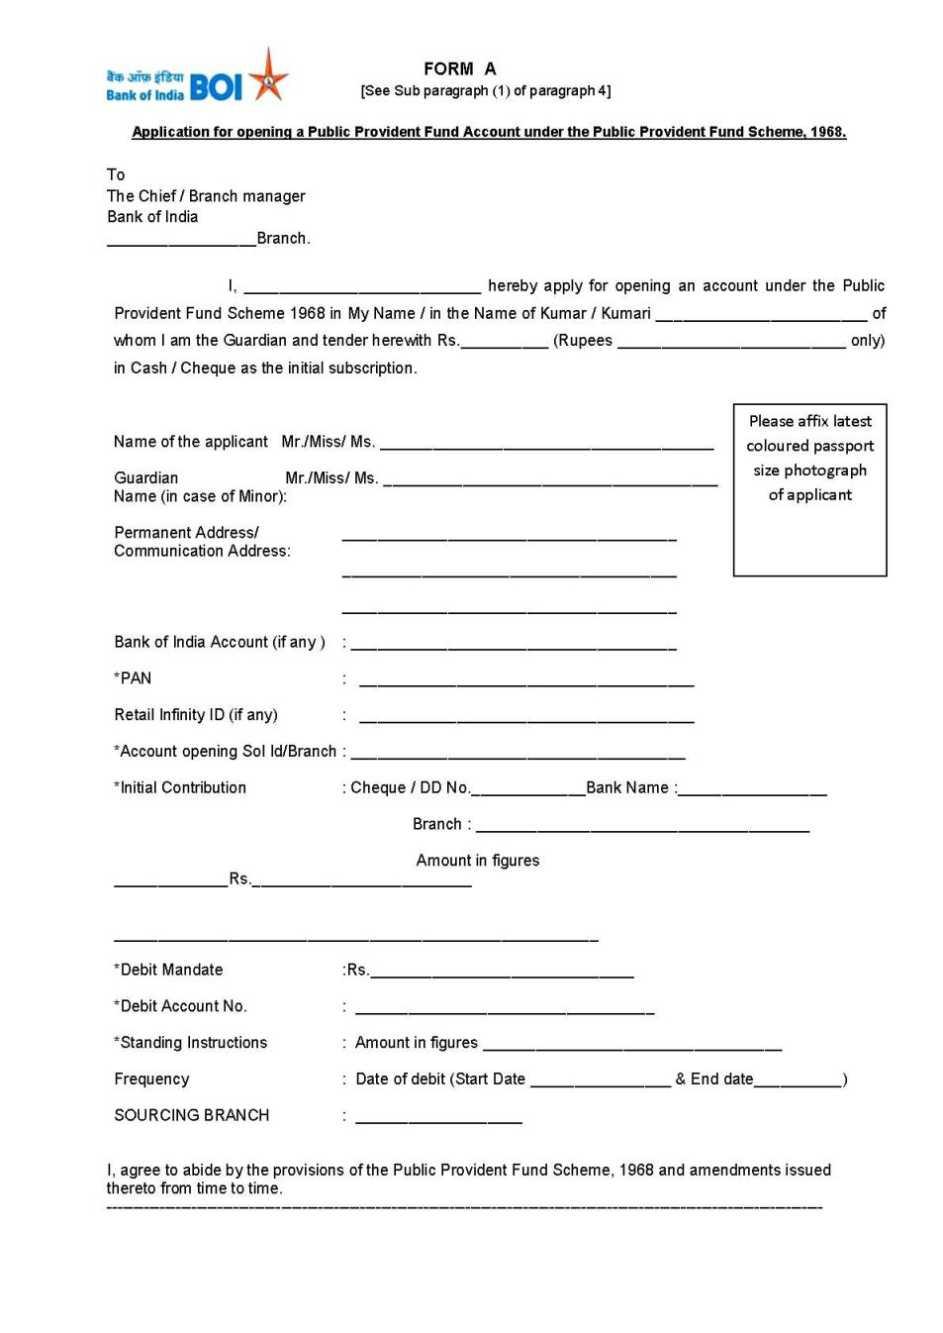 Bank-Of-India-Application-Form-Download-2 Online Application Form Boi on create job, postal jobs, local job, uk visa, learner's license, giants grocery, university johannesburg,